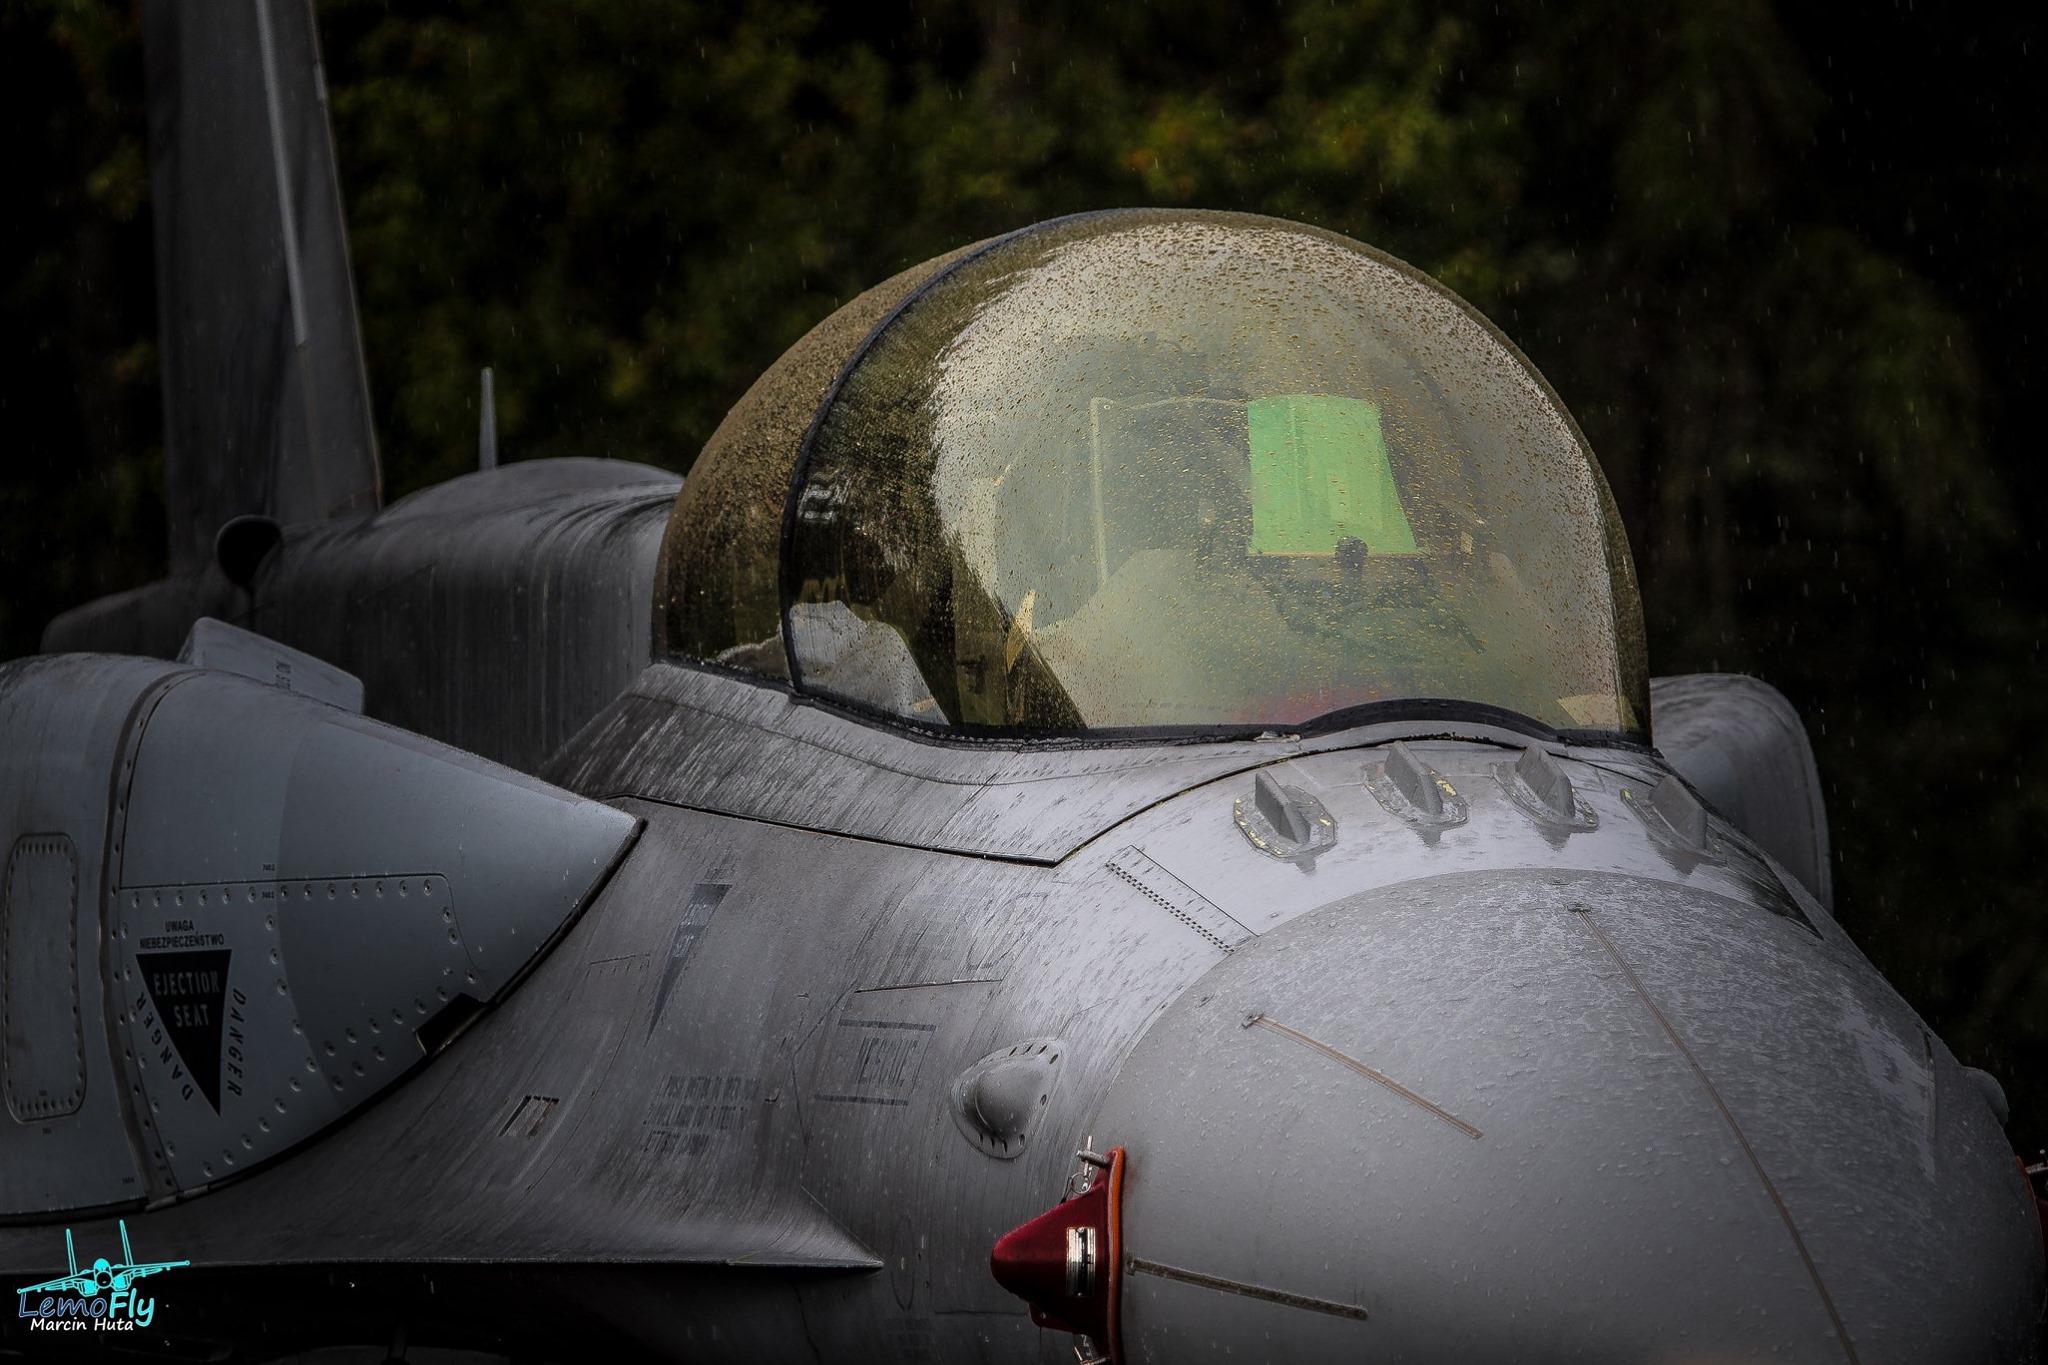 F 16 LemoFly Marcin Huta 4